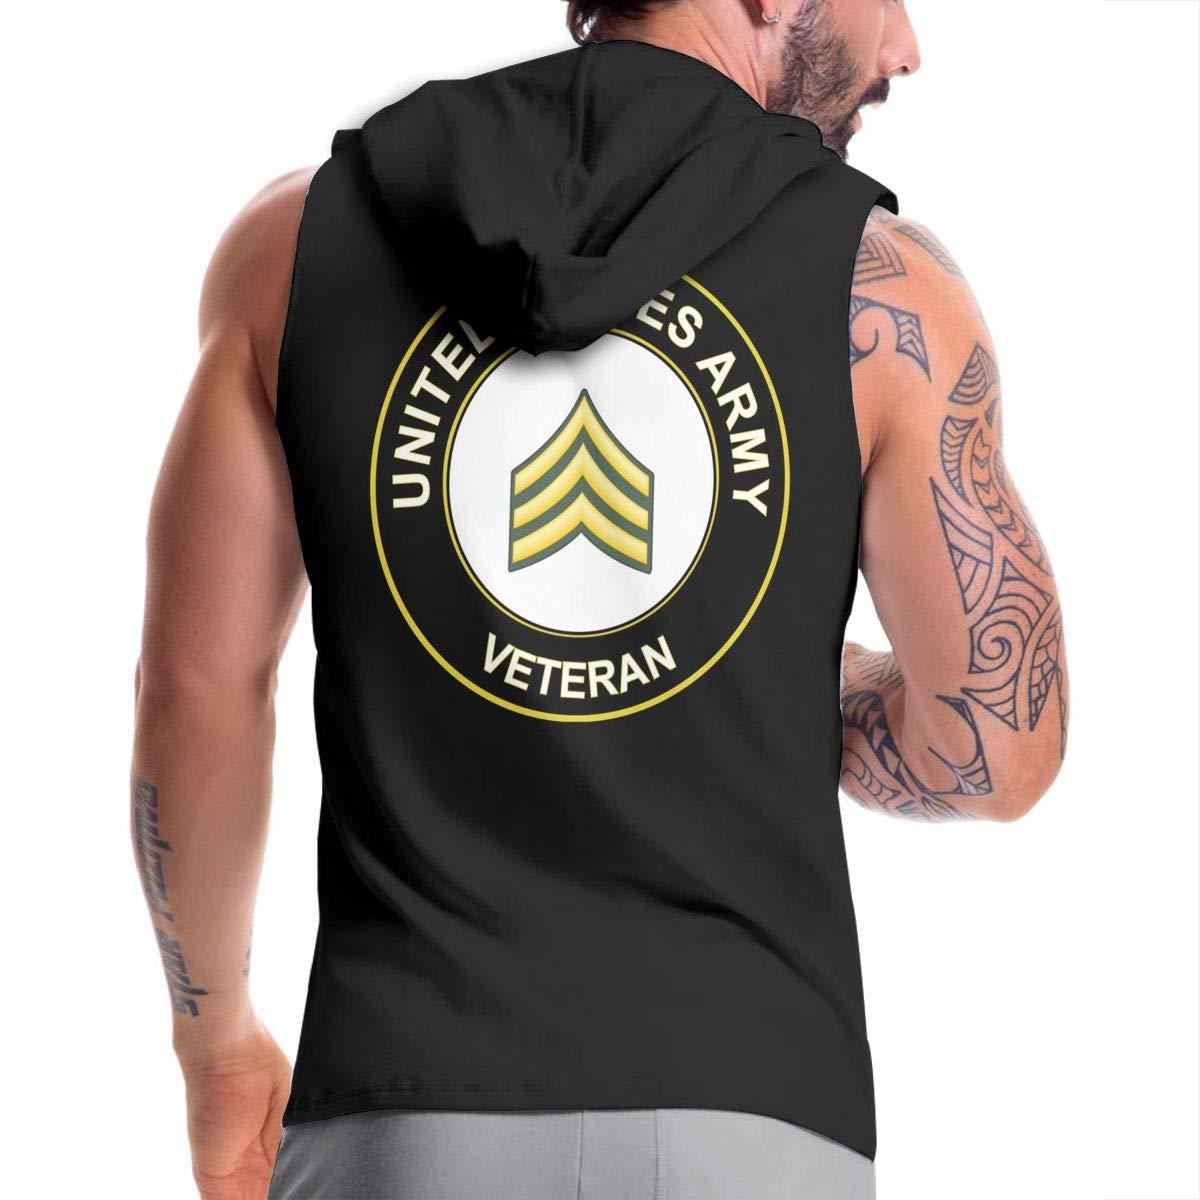 NMBOJR US Army Sergeant Veteran Mens Hipster Hip Hop Hoodies Shirts